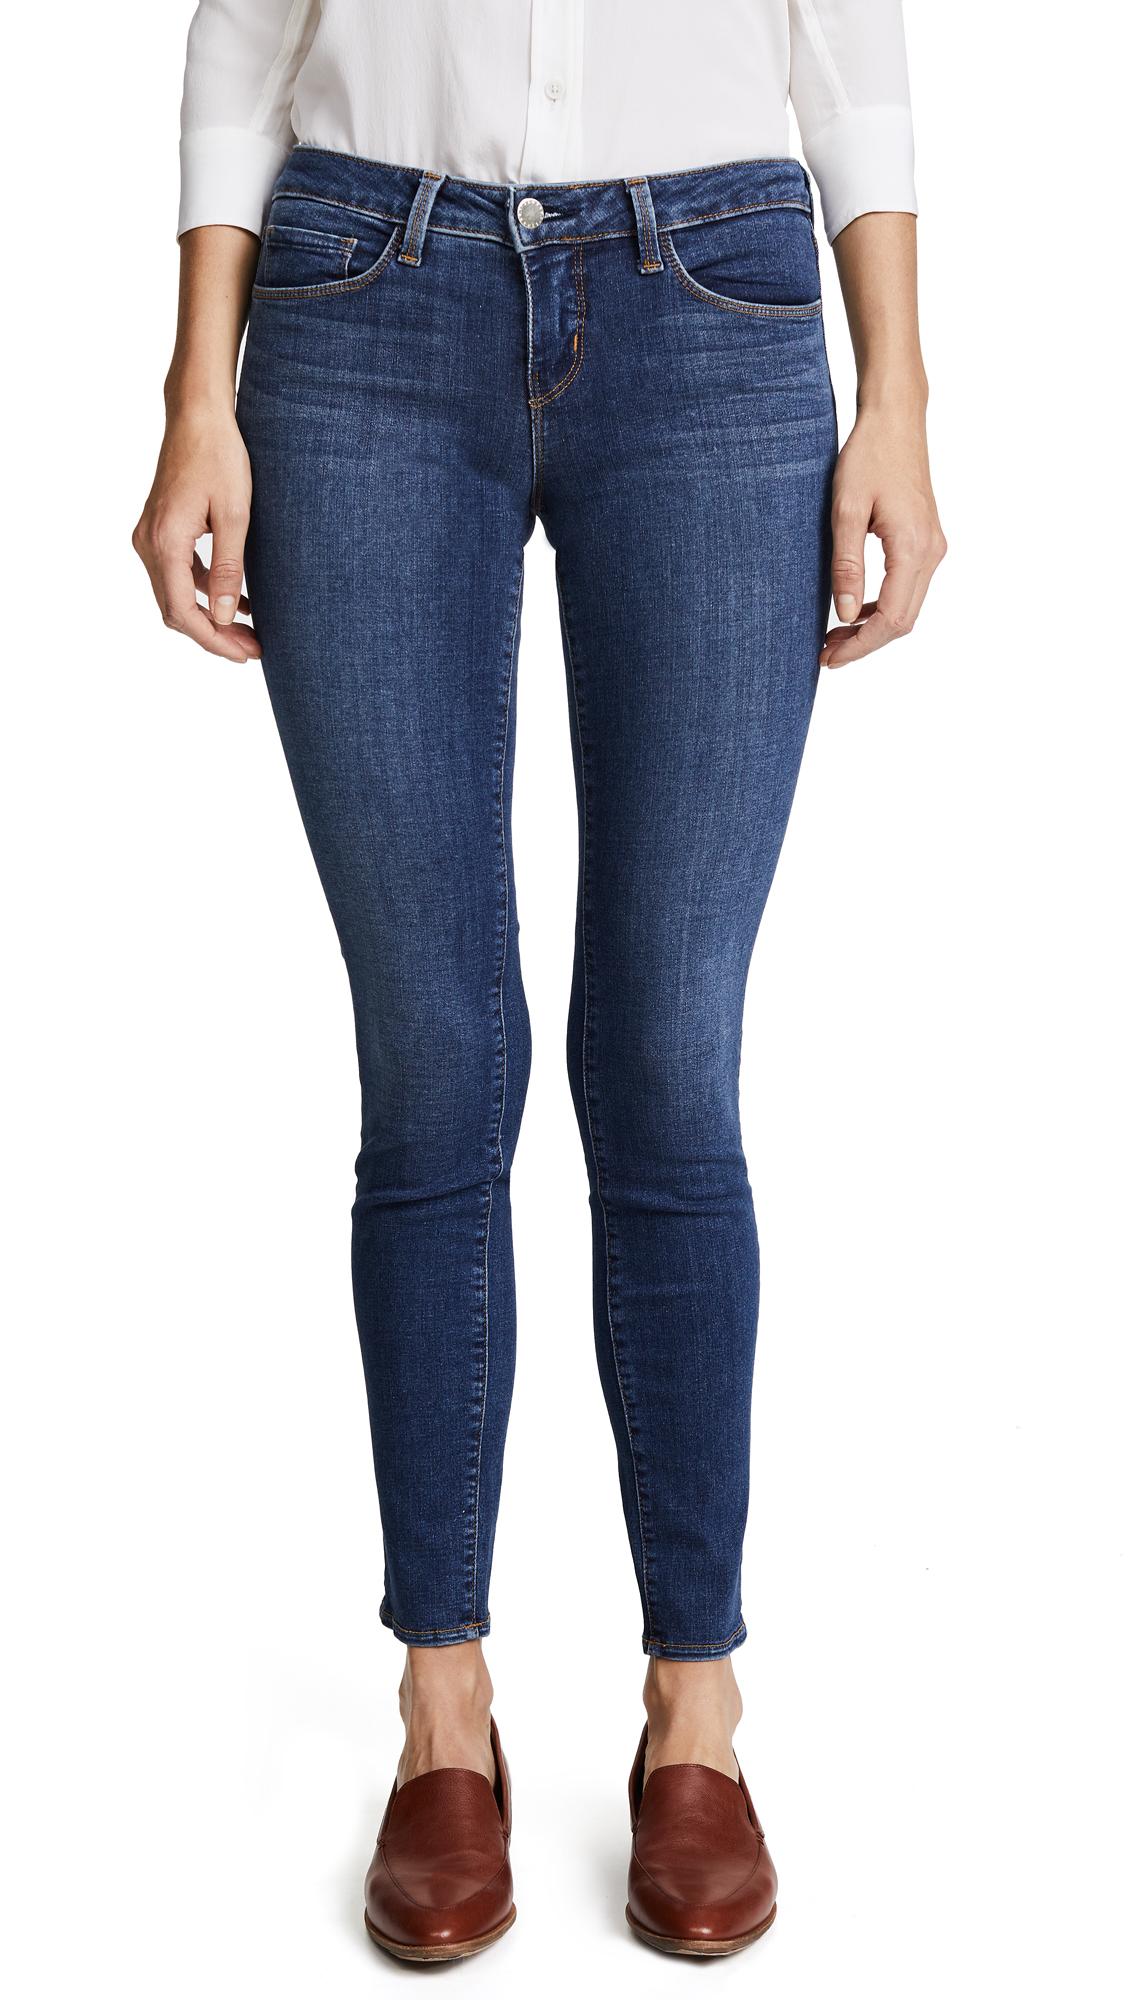 LAGENCE Chantal Skinny Jeans - Dark Vintage